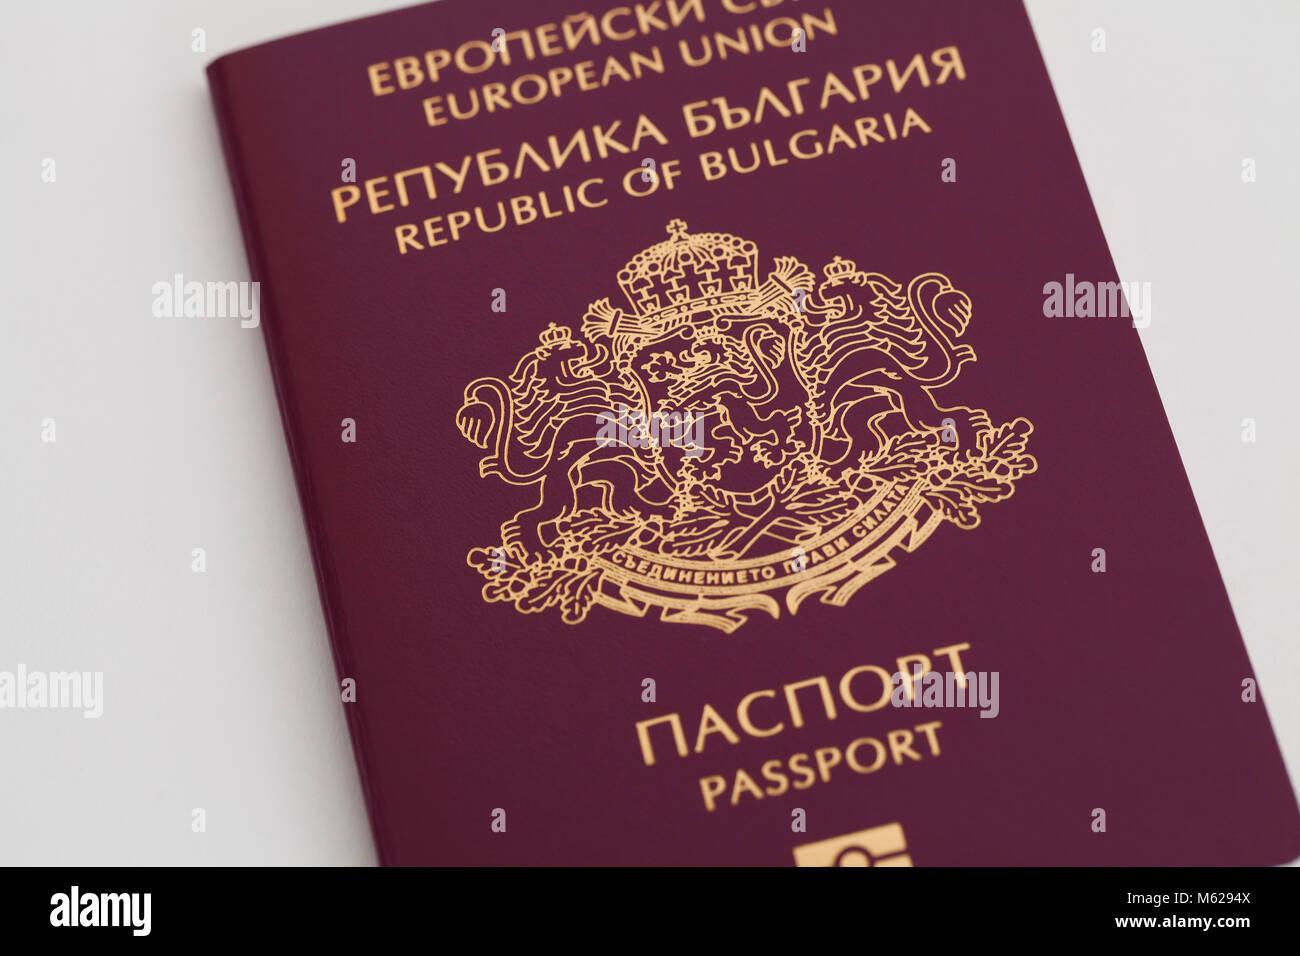 New Bulgarian passport (European Union Republic of Bulgaria) - Stock Image